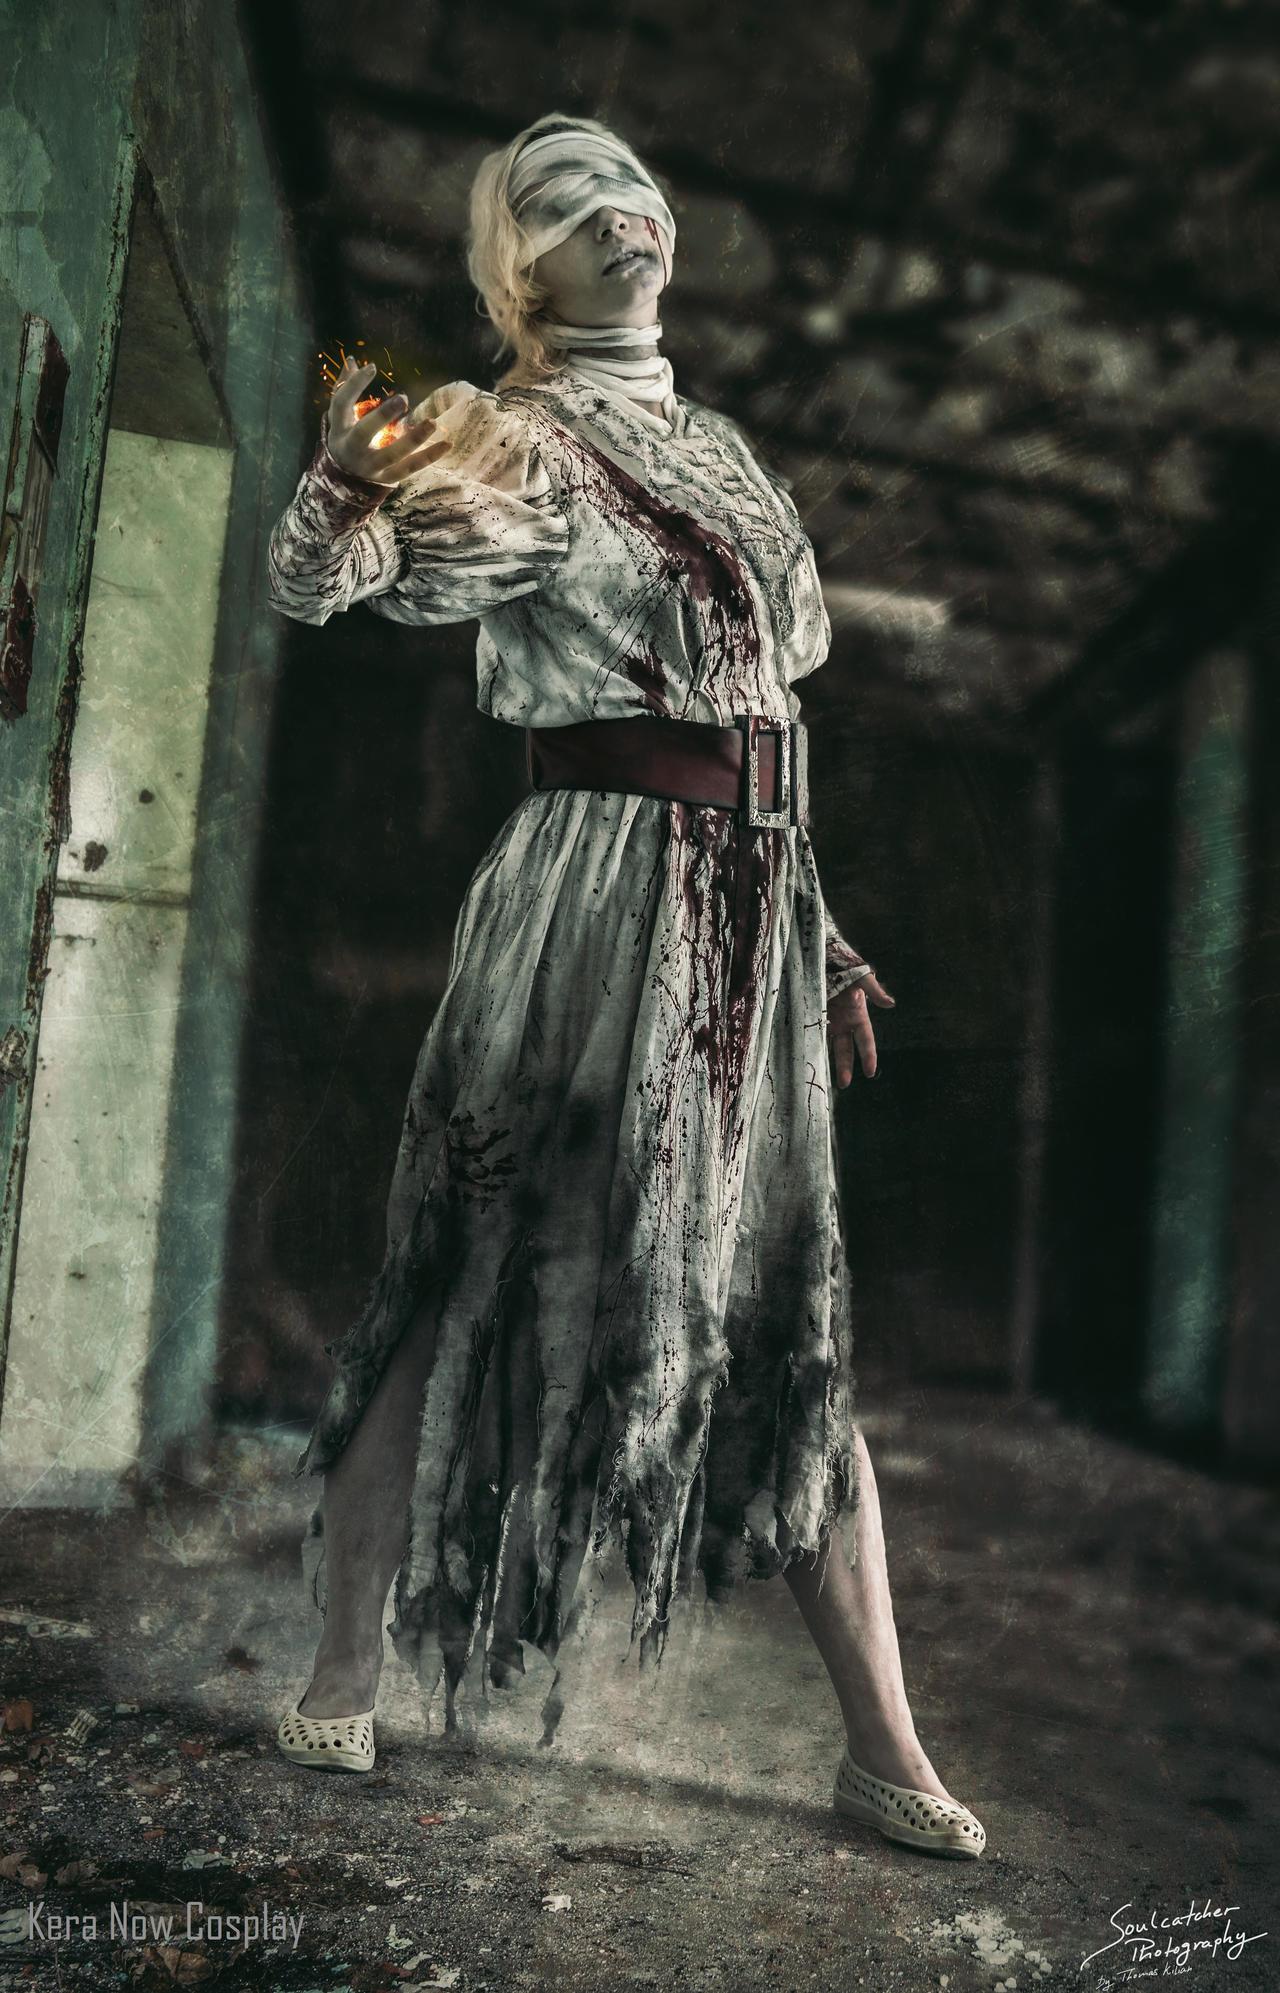 Dead by Daylight: The Nurse - Your last breath